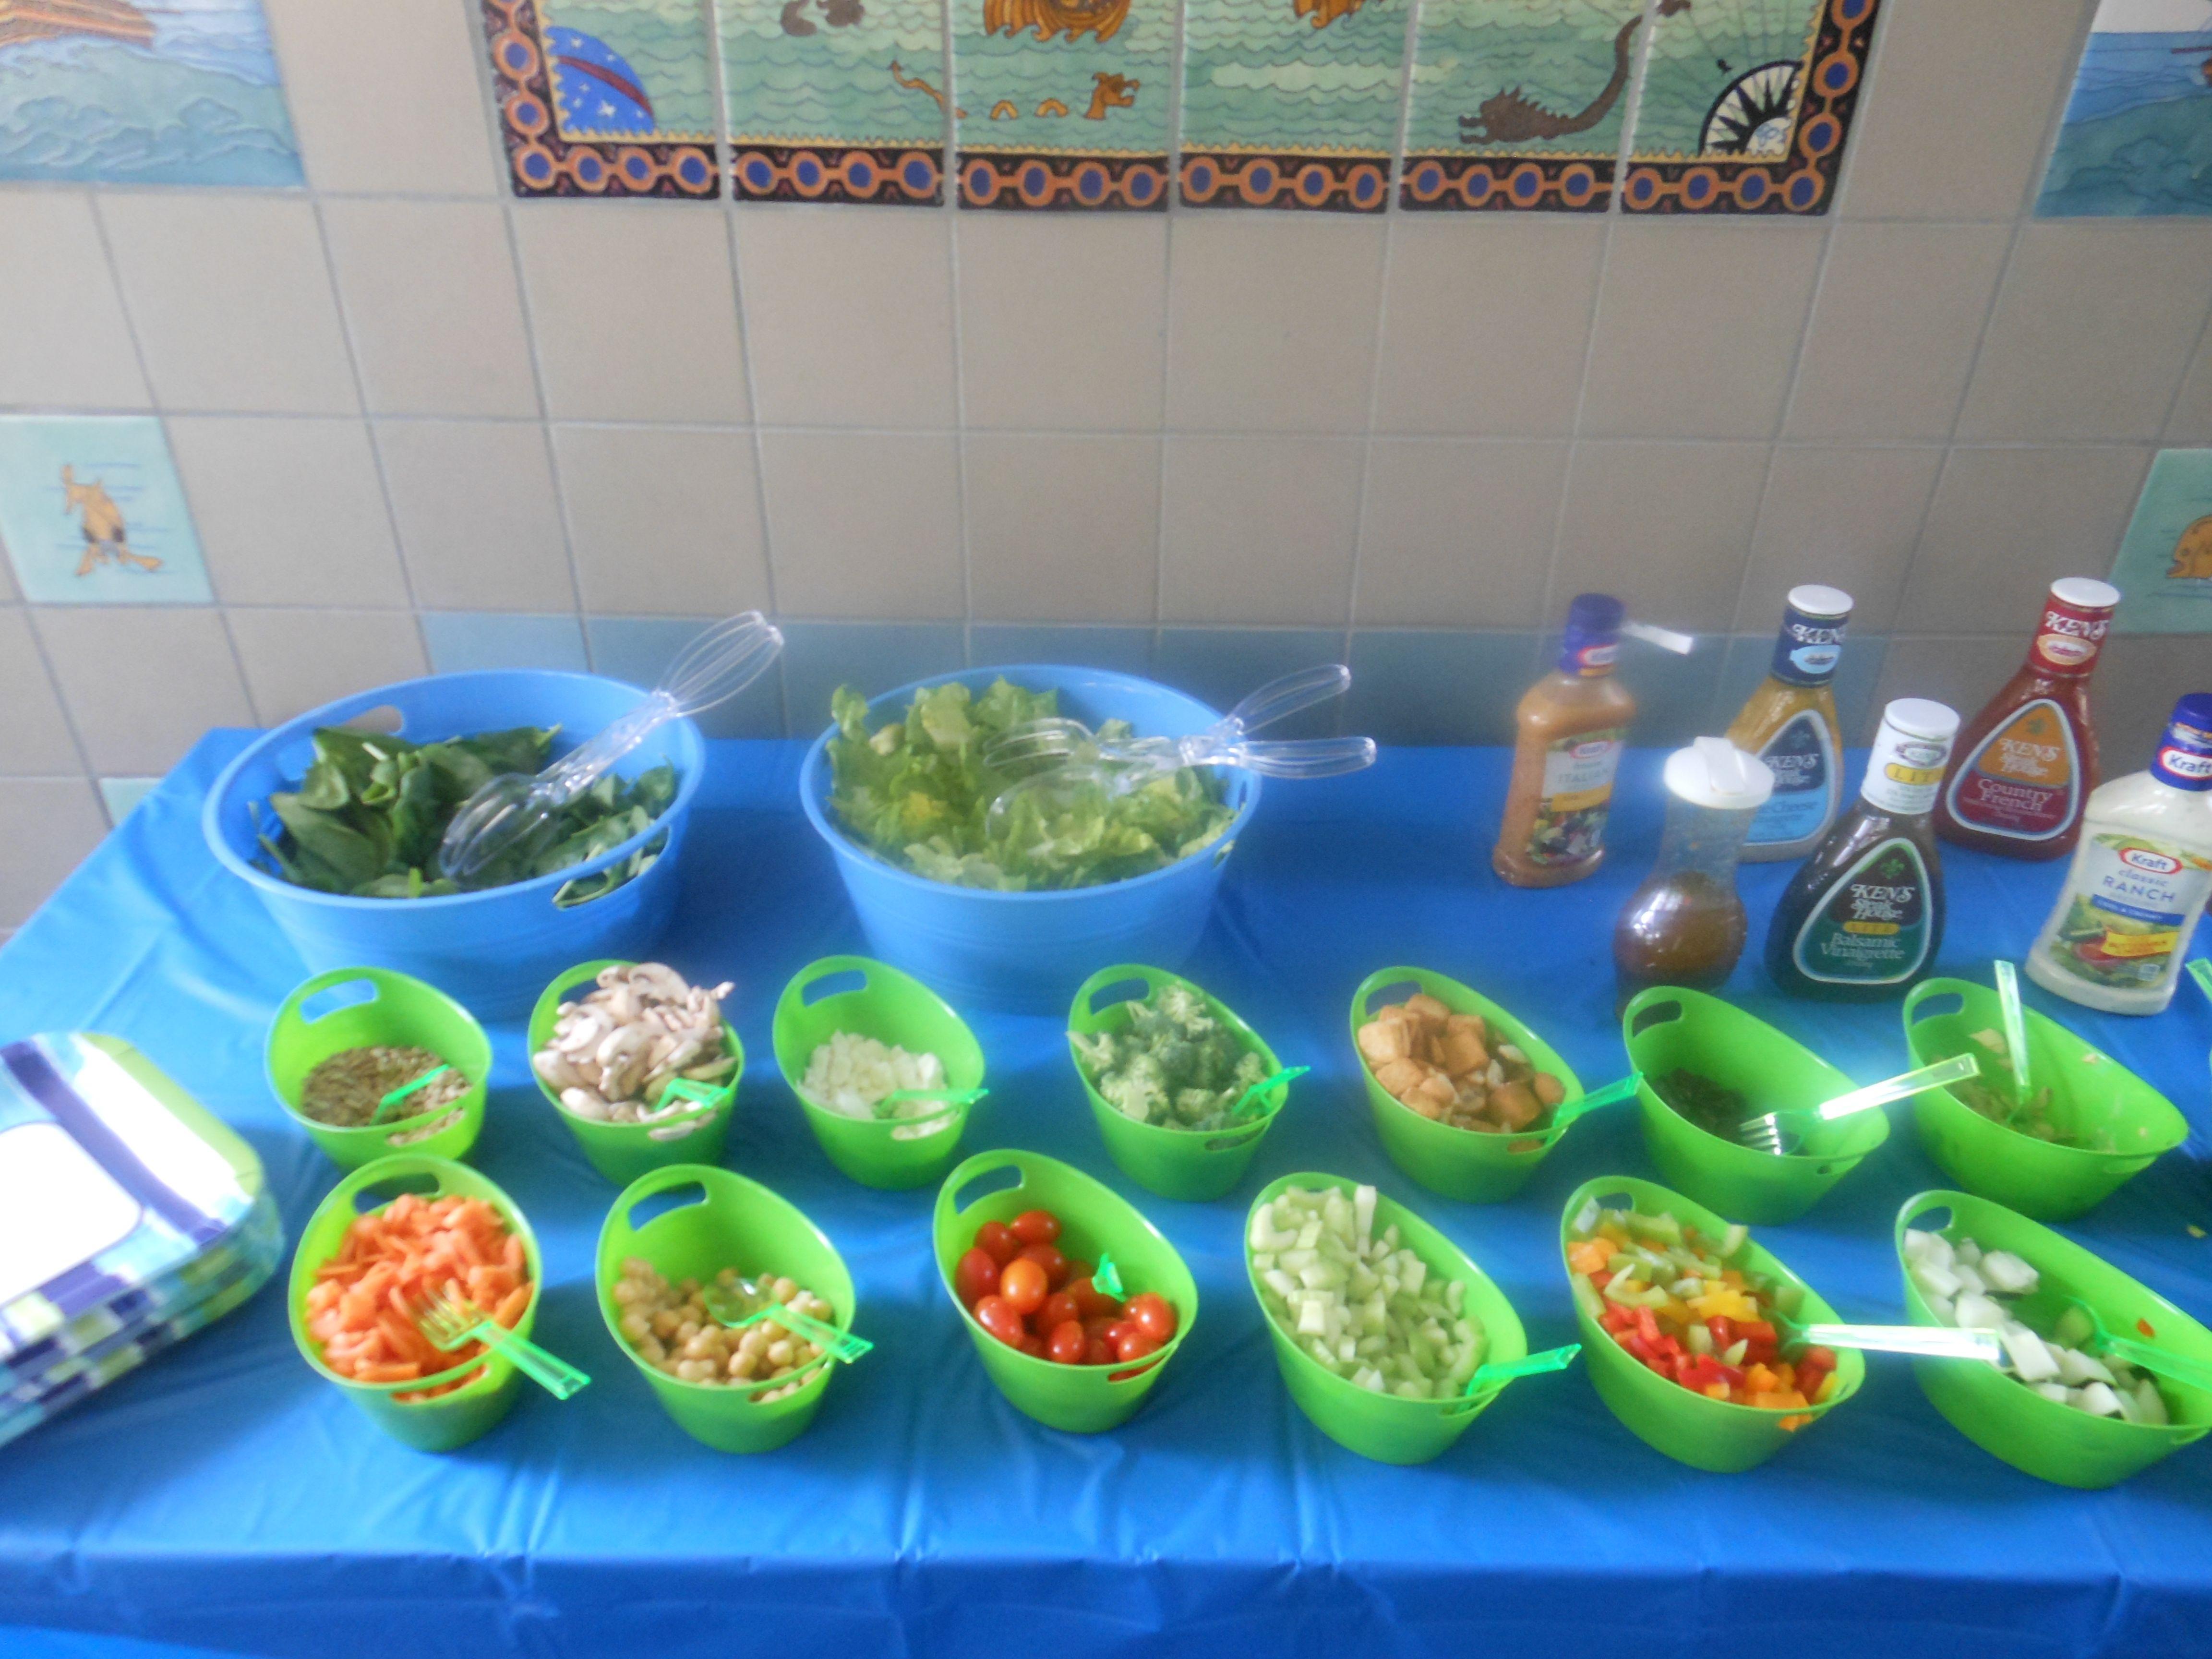 Great lunch ideas, Soup bar and Platter ideas on Pinterest  Salad Bar Luncheon Ideas